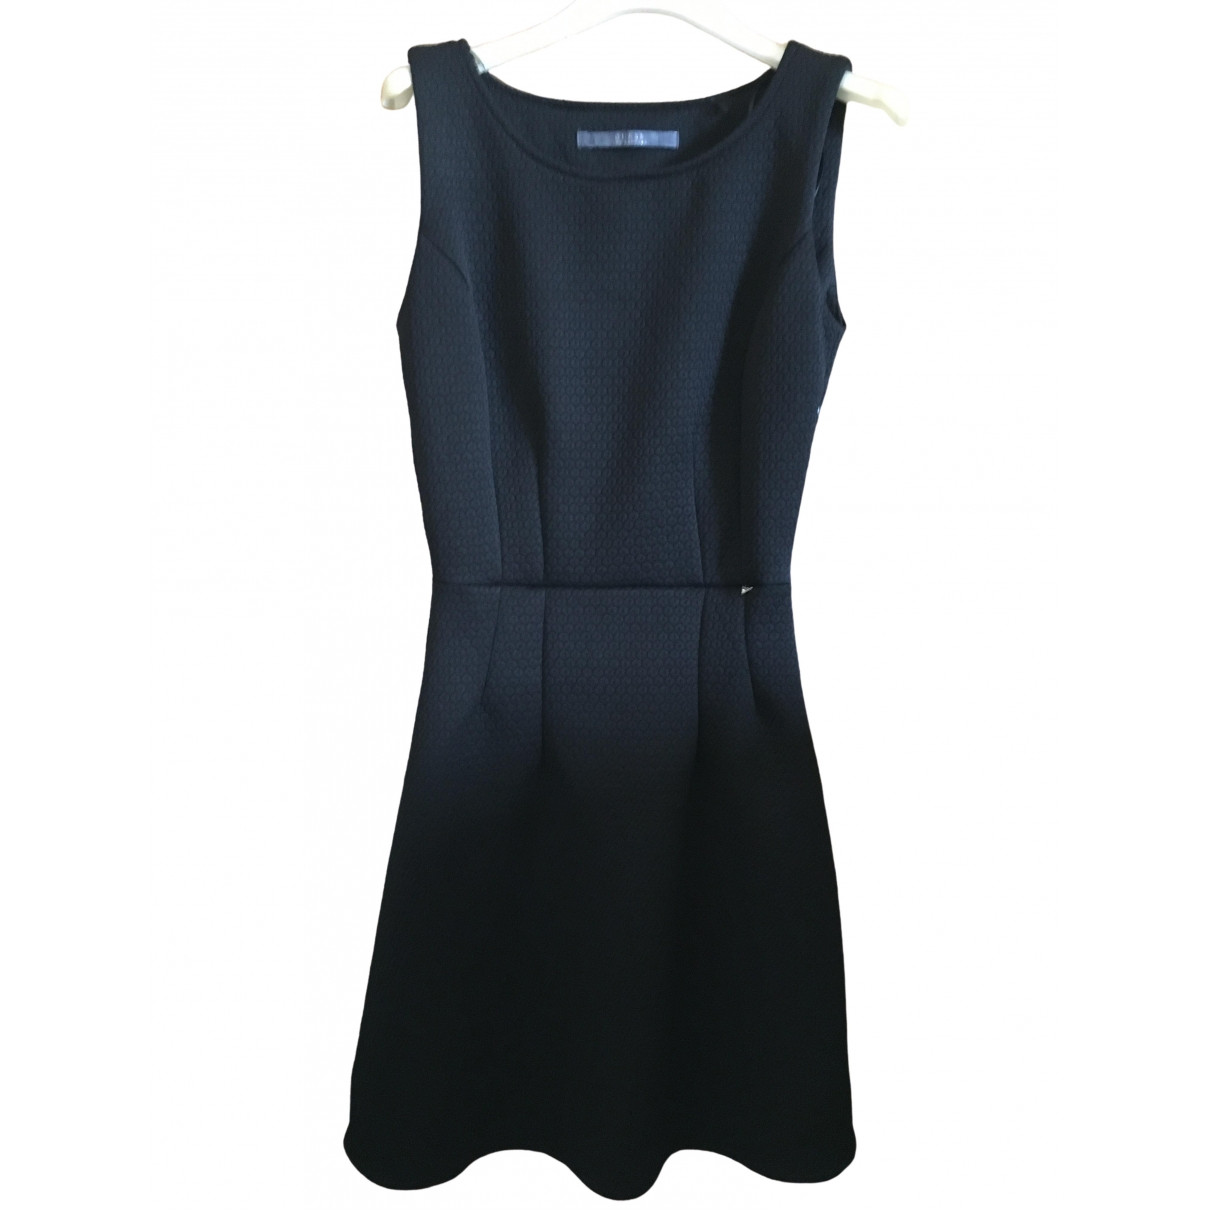 Guess \N Black dress for Women XS International